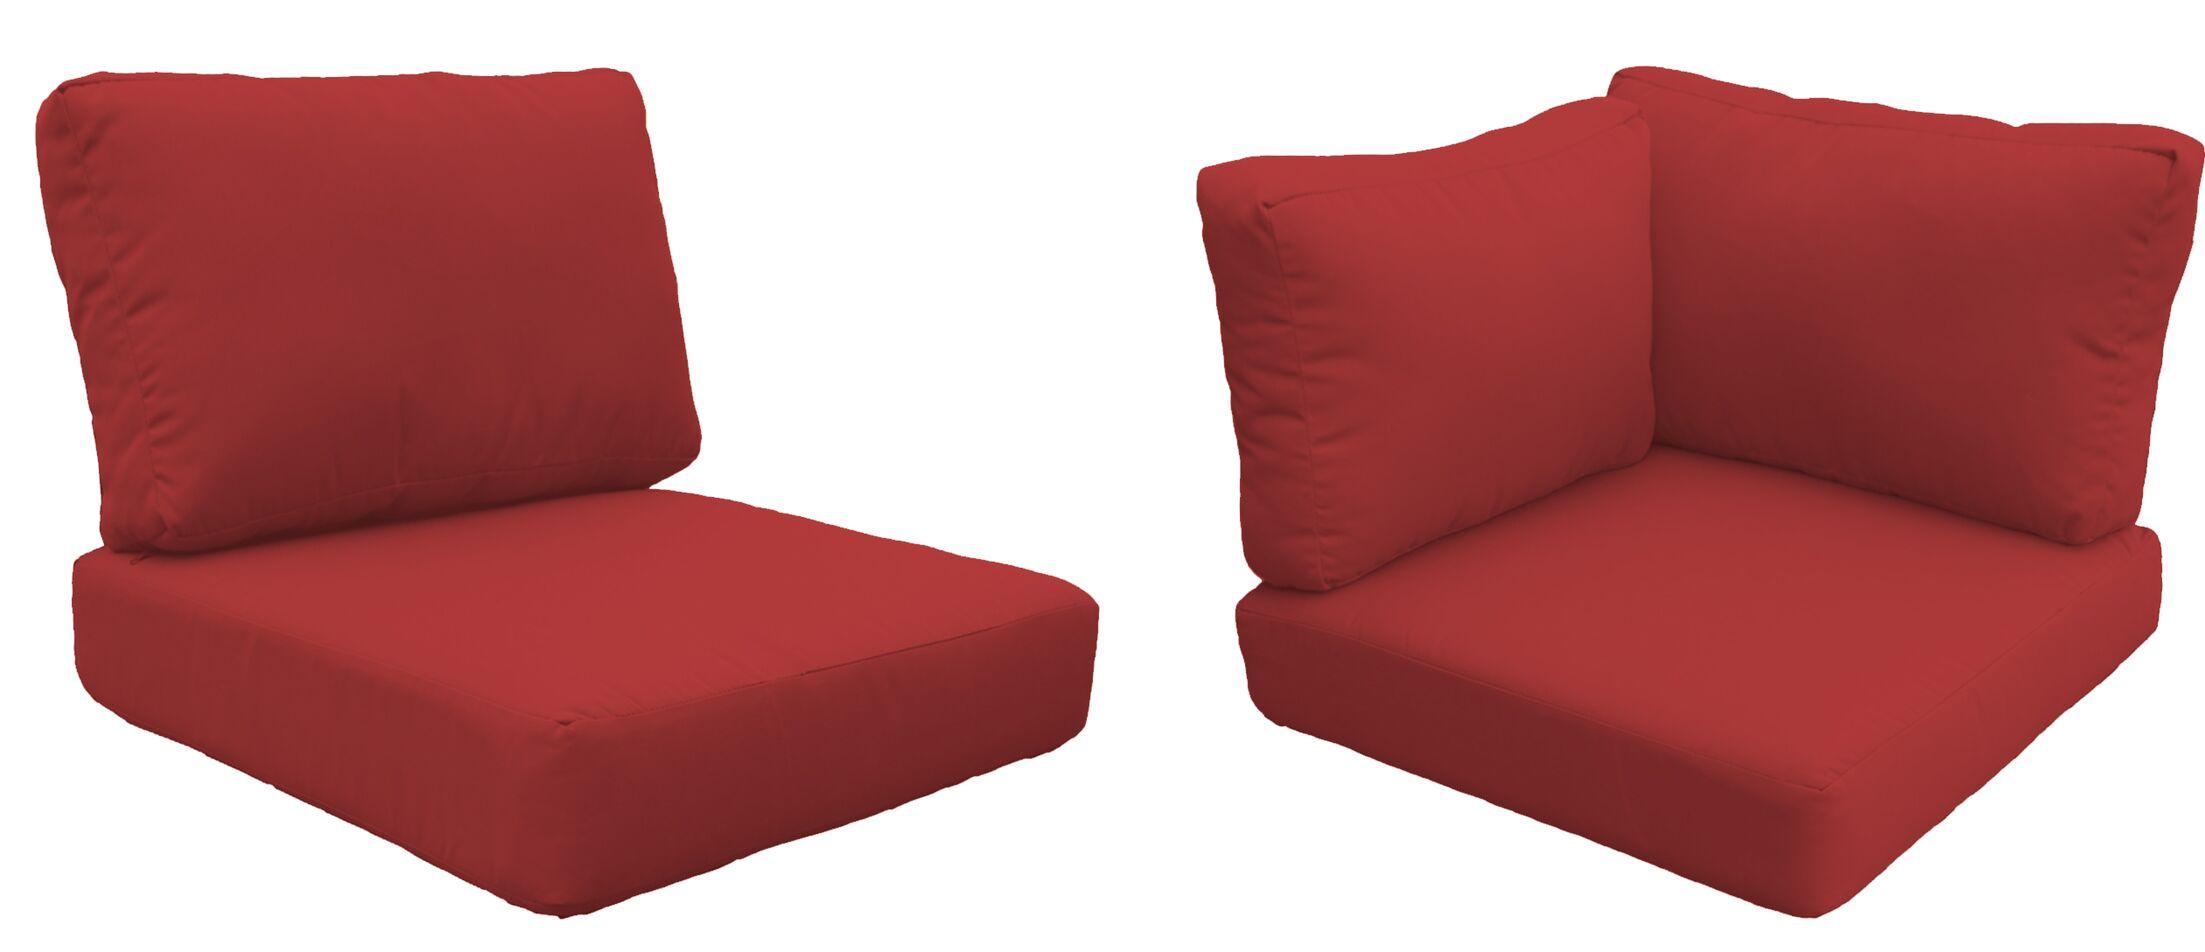 Fairmont Outdoor�Replacement Cushion Set Fabric: Terracotta